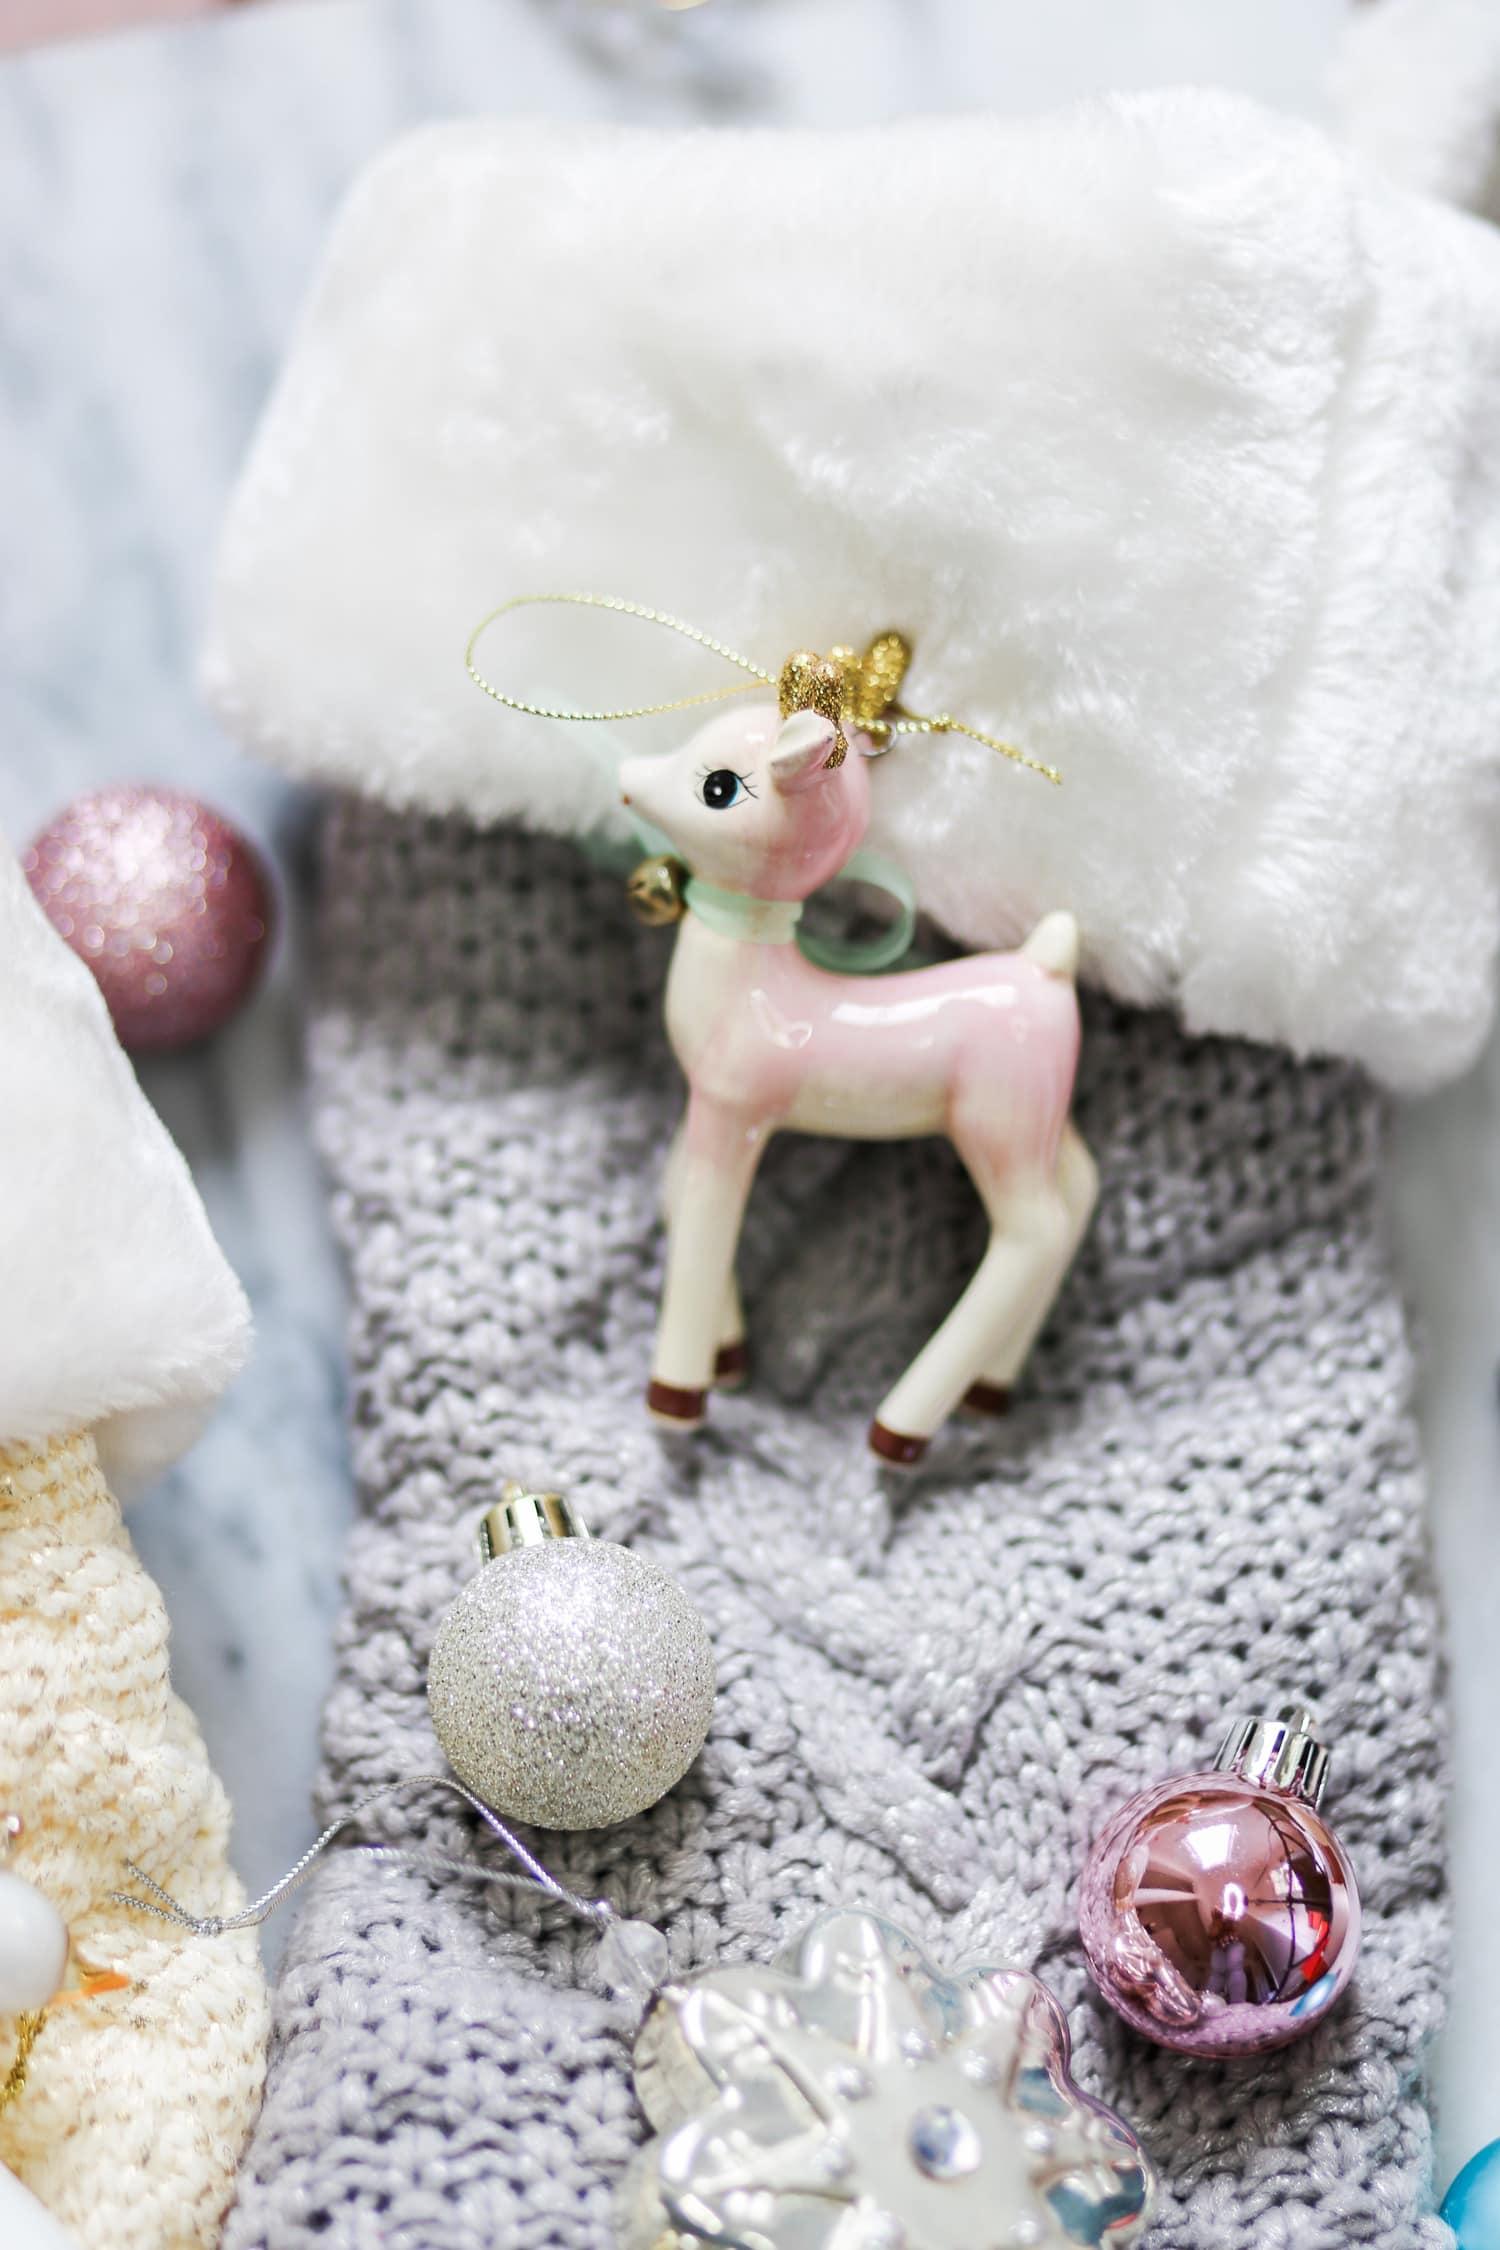 stocking cute Christmas gift ideas Christmas tree ornaments Ashley Brooke Nicholas blogger